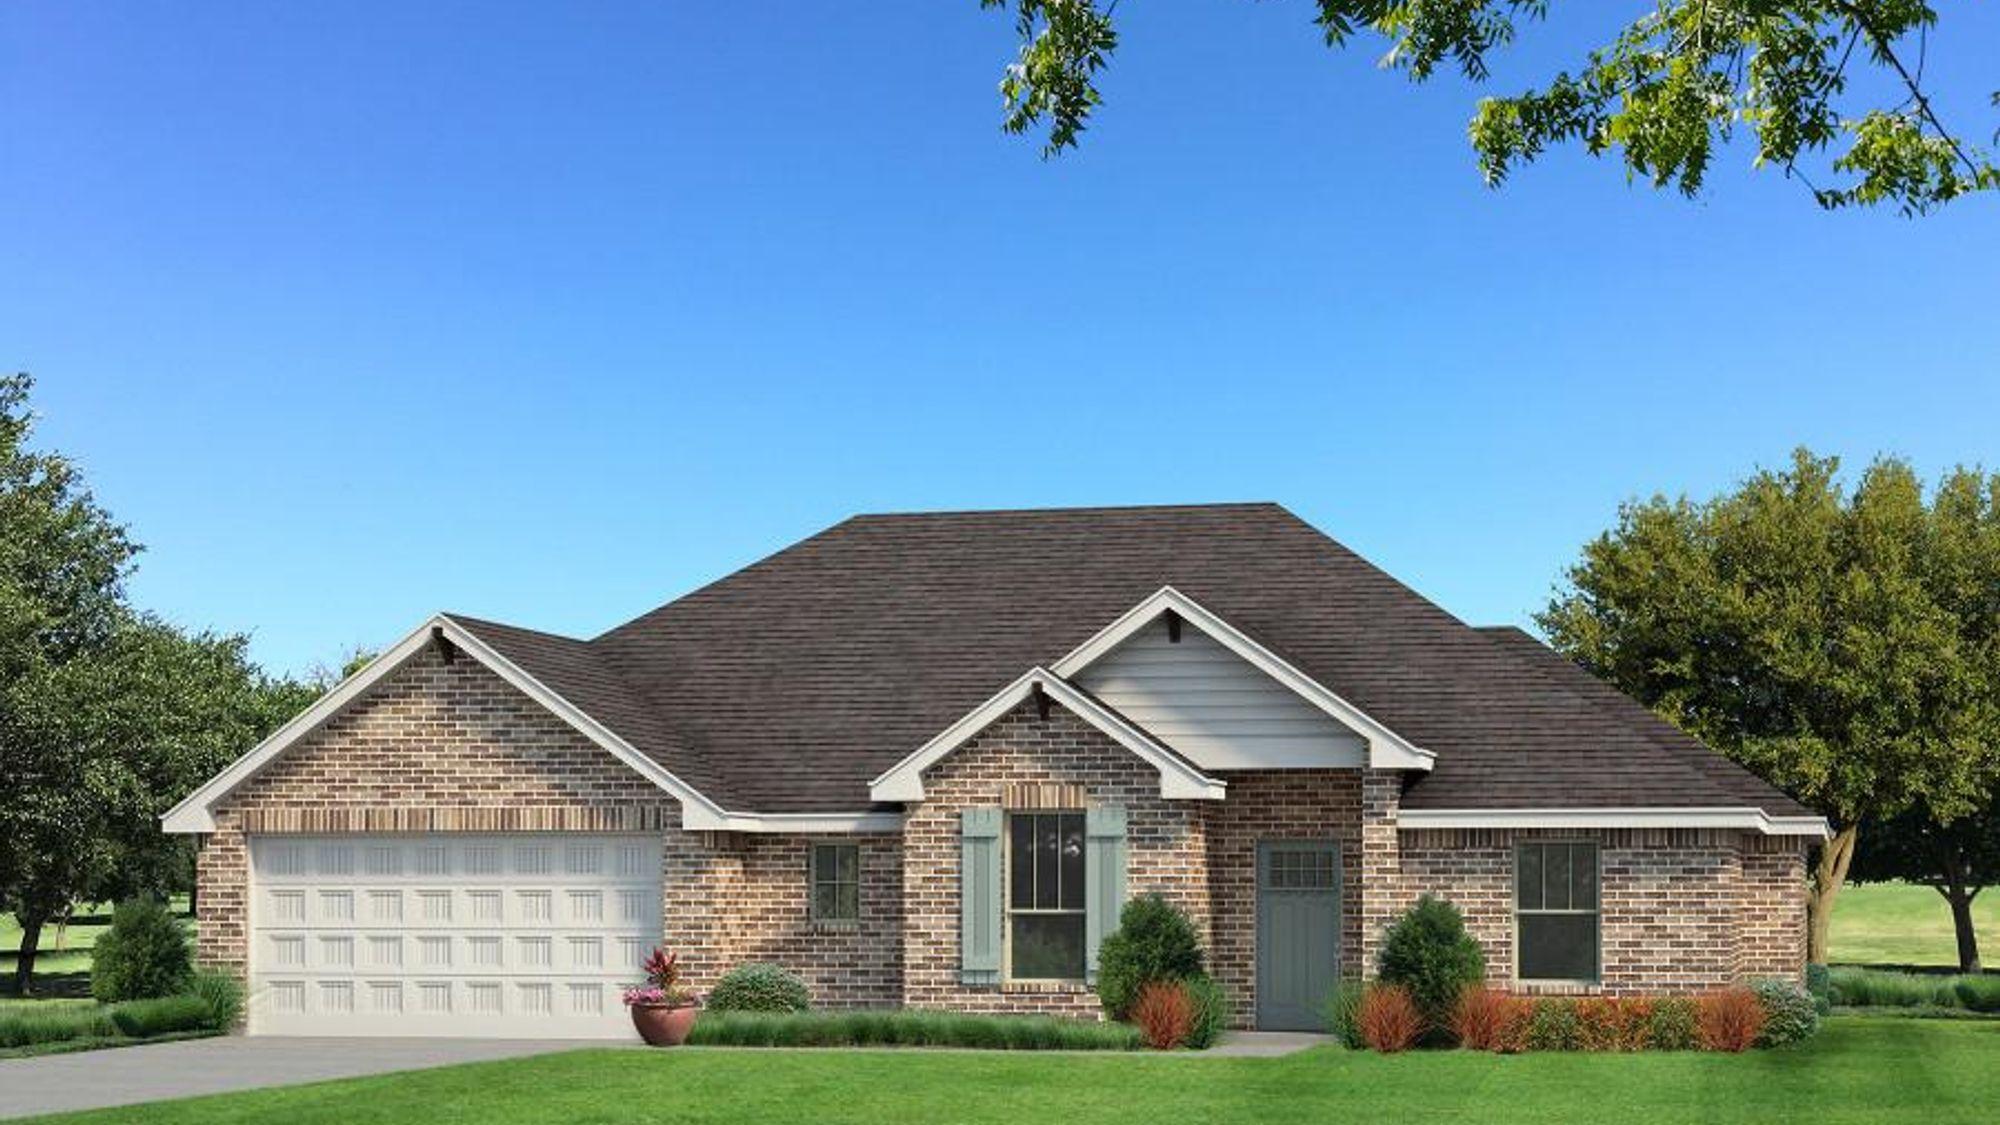 Homes by Taber Kristine - Brick Elevation